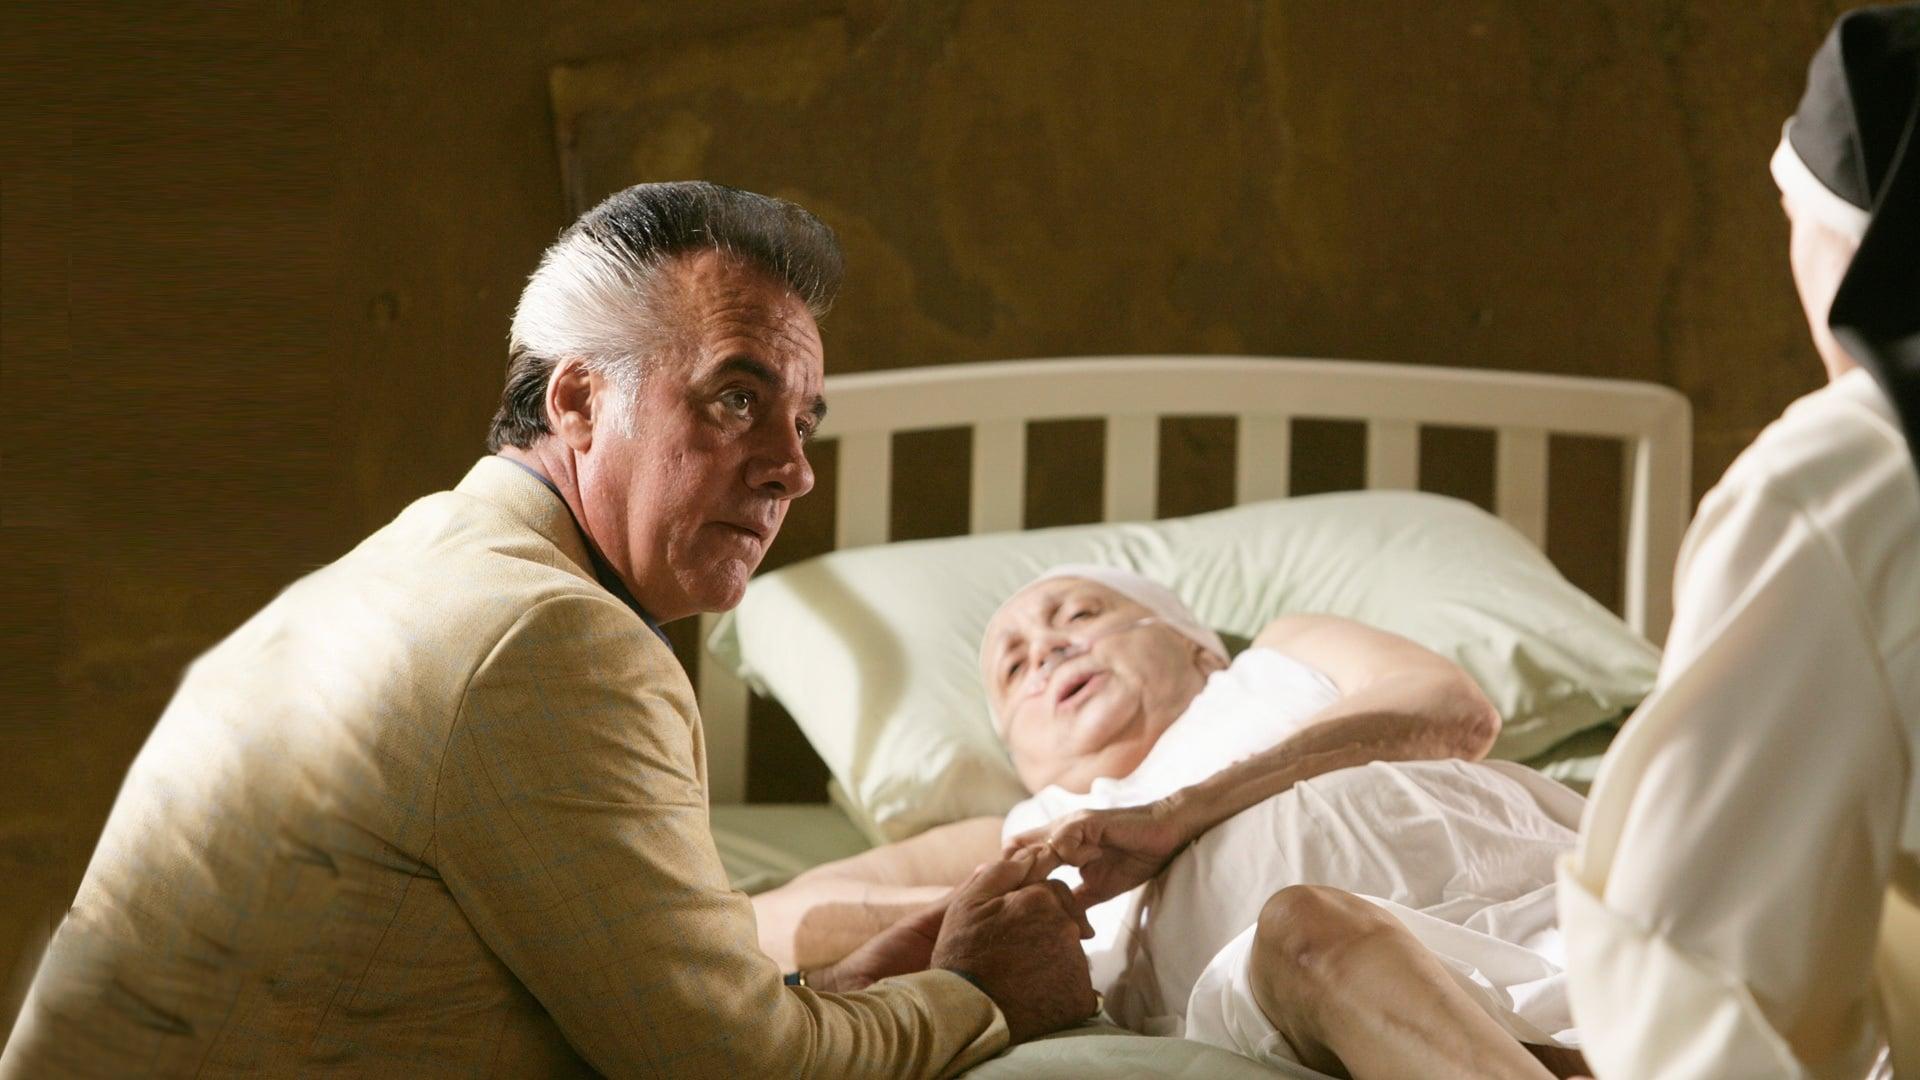 The Sopranos: Season 6 x Episode 4 - free to watch online